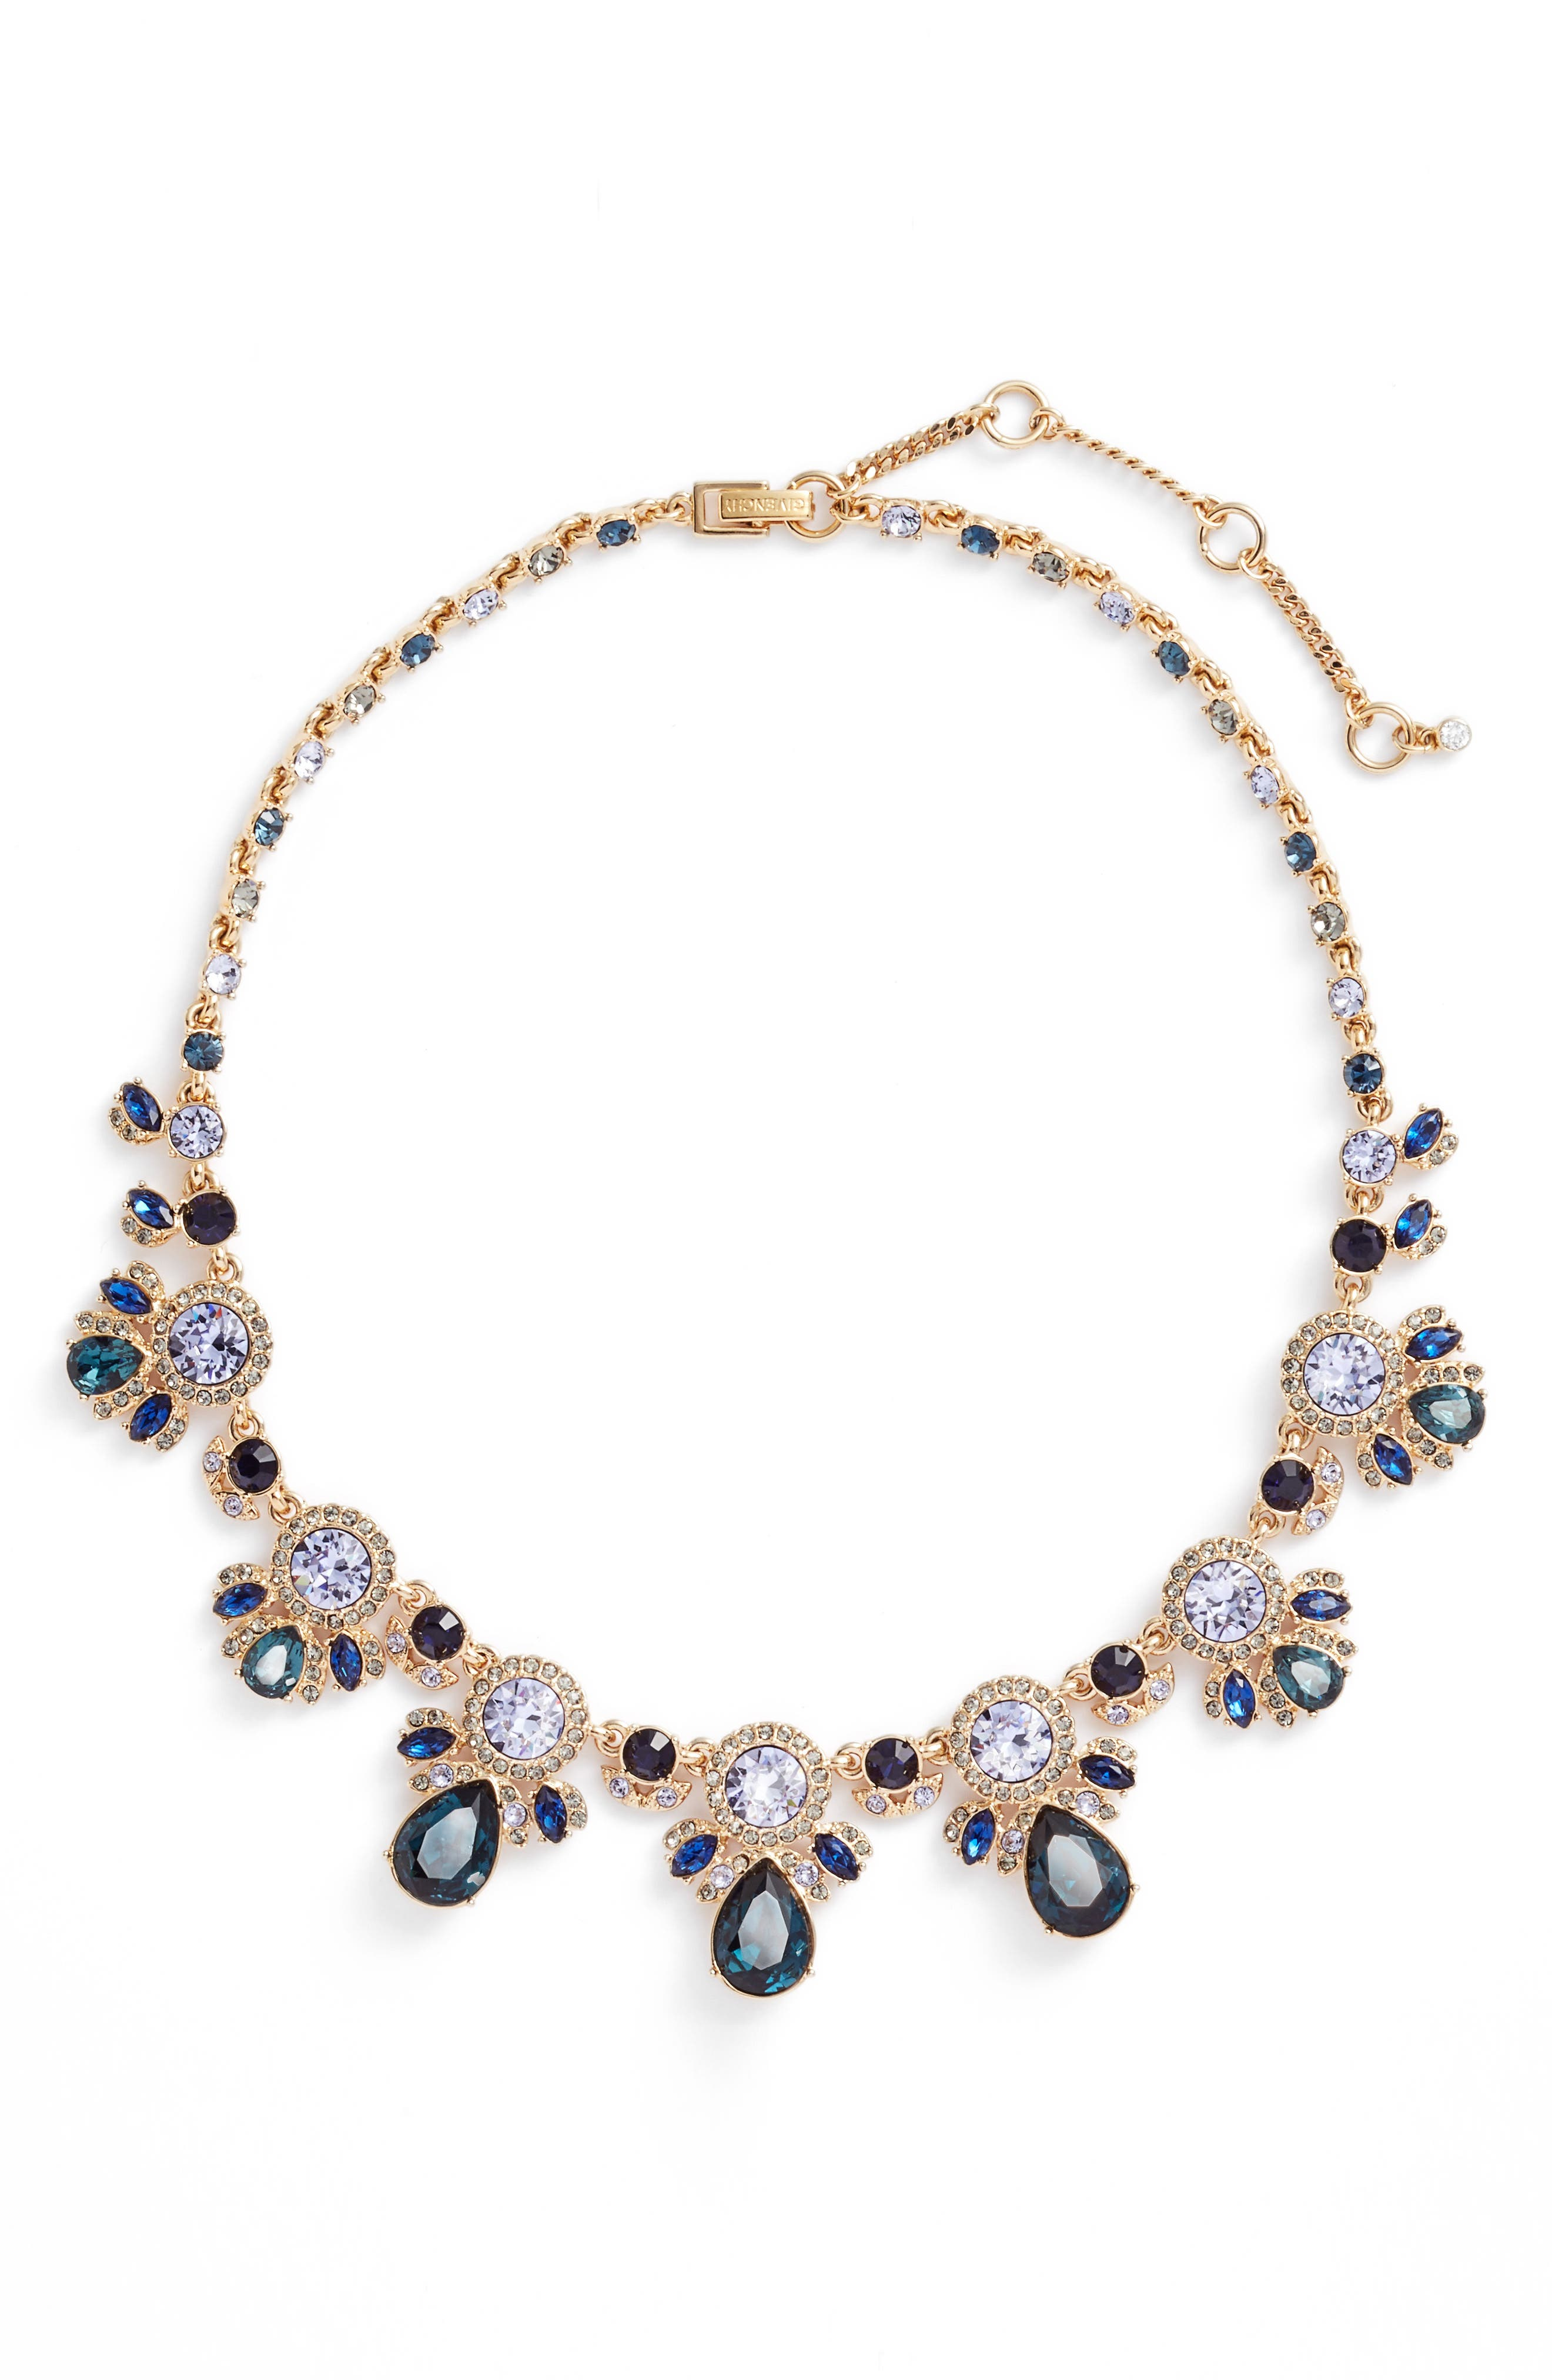 Main Image - Givenchy Drama Crystal Collar Necklace